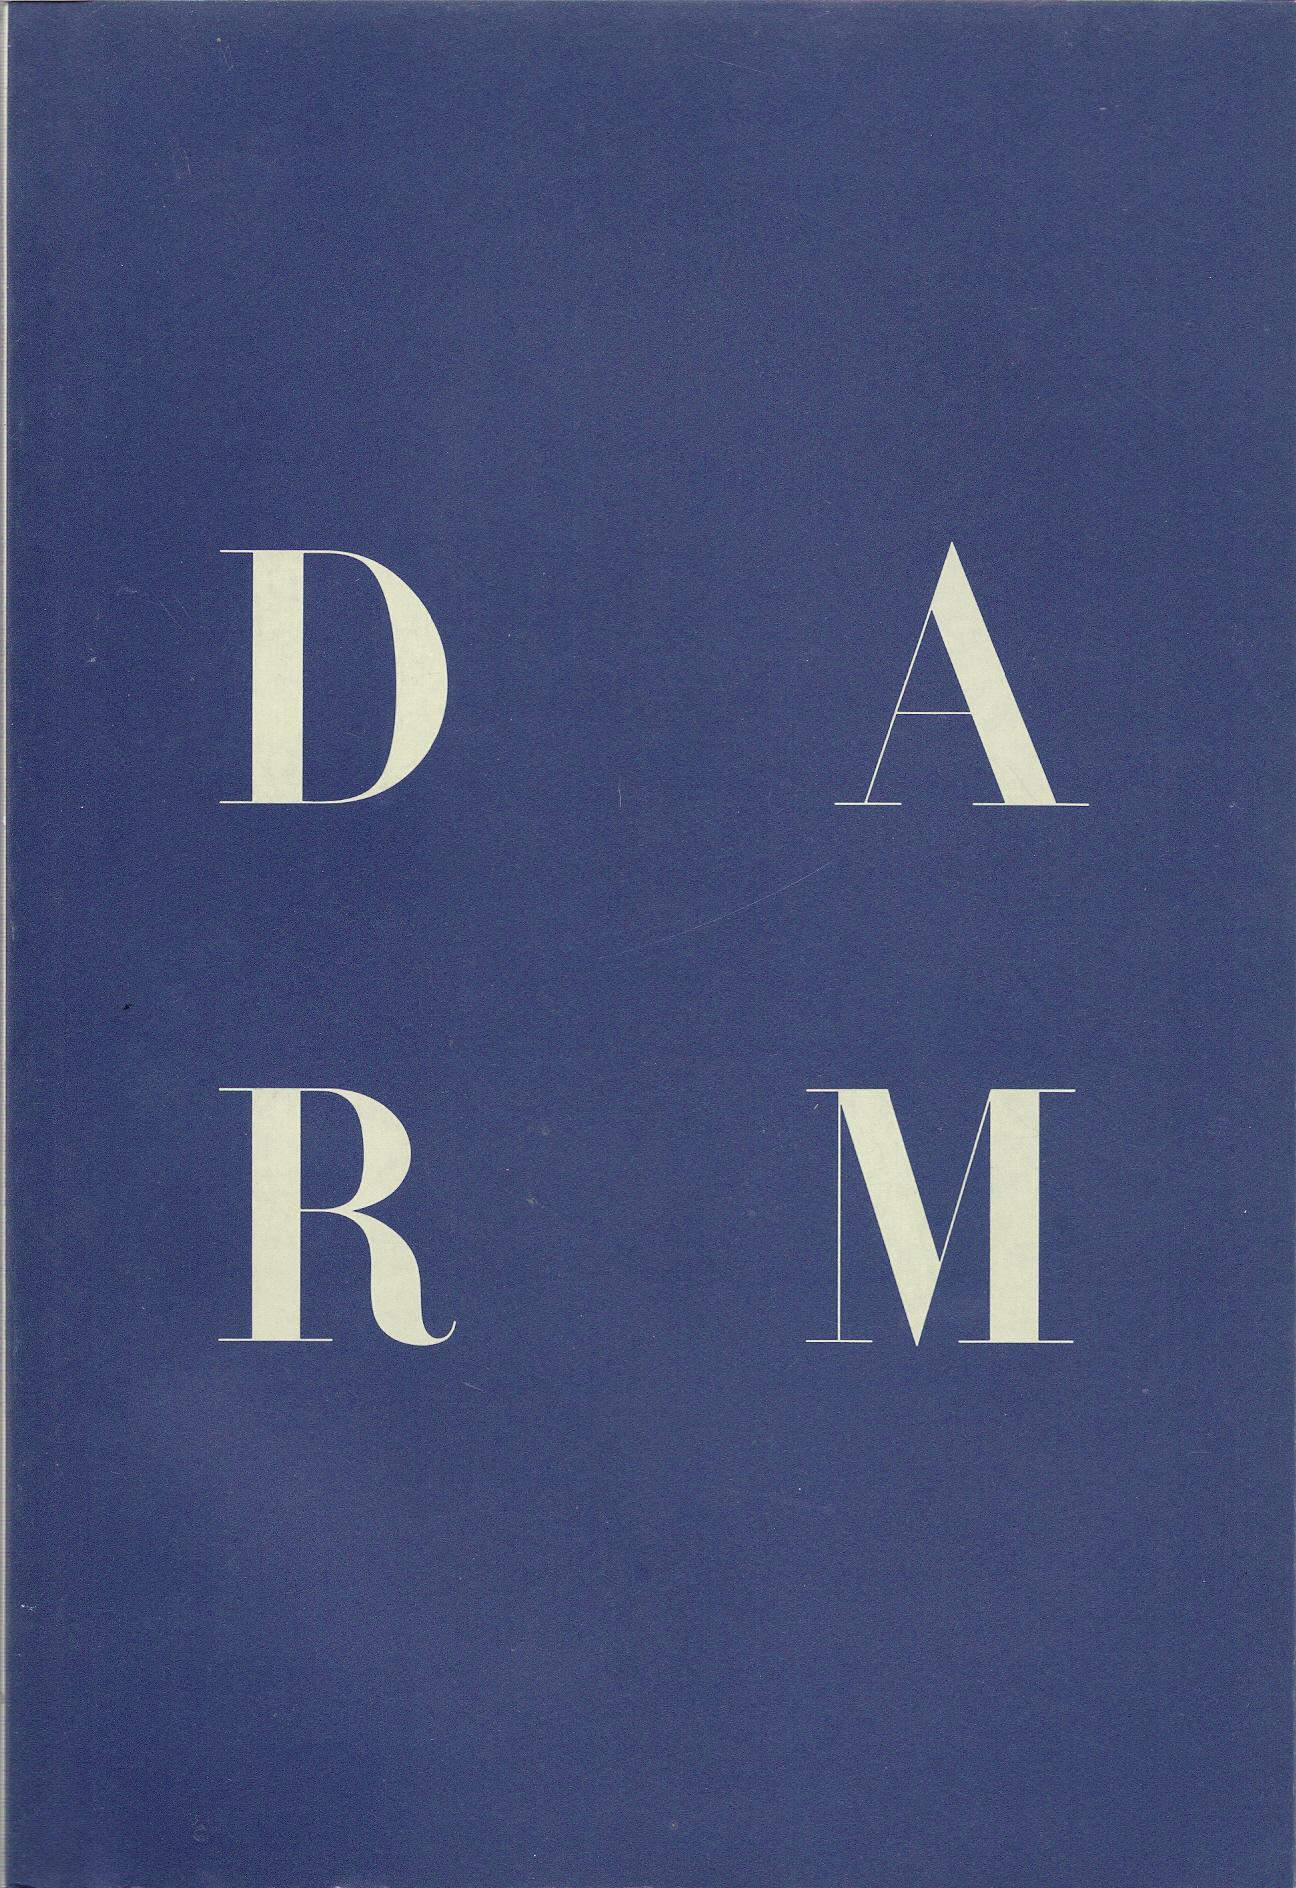 D.A.R.M Fortsetzung , 1992